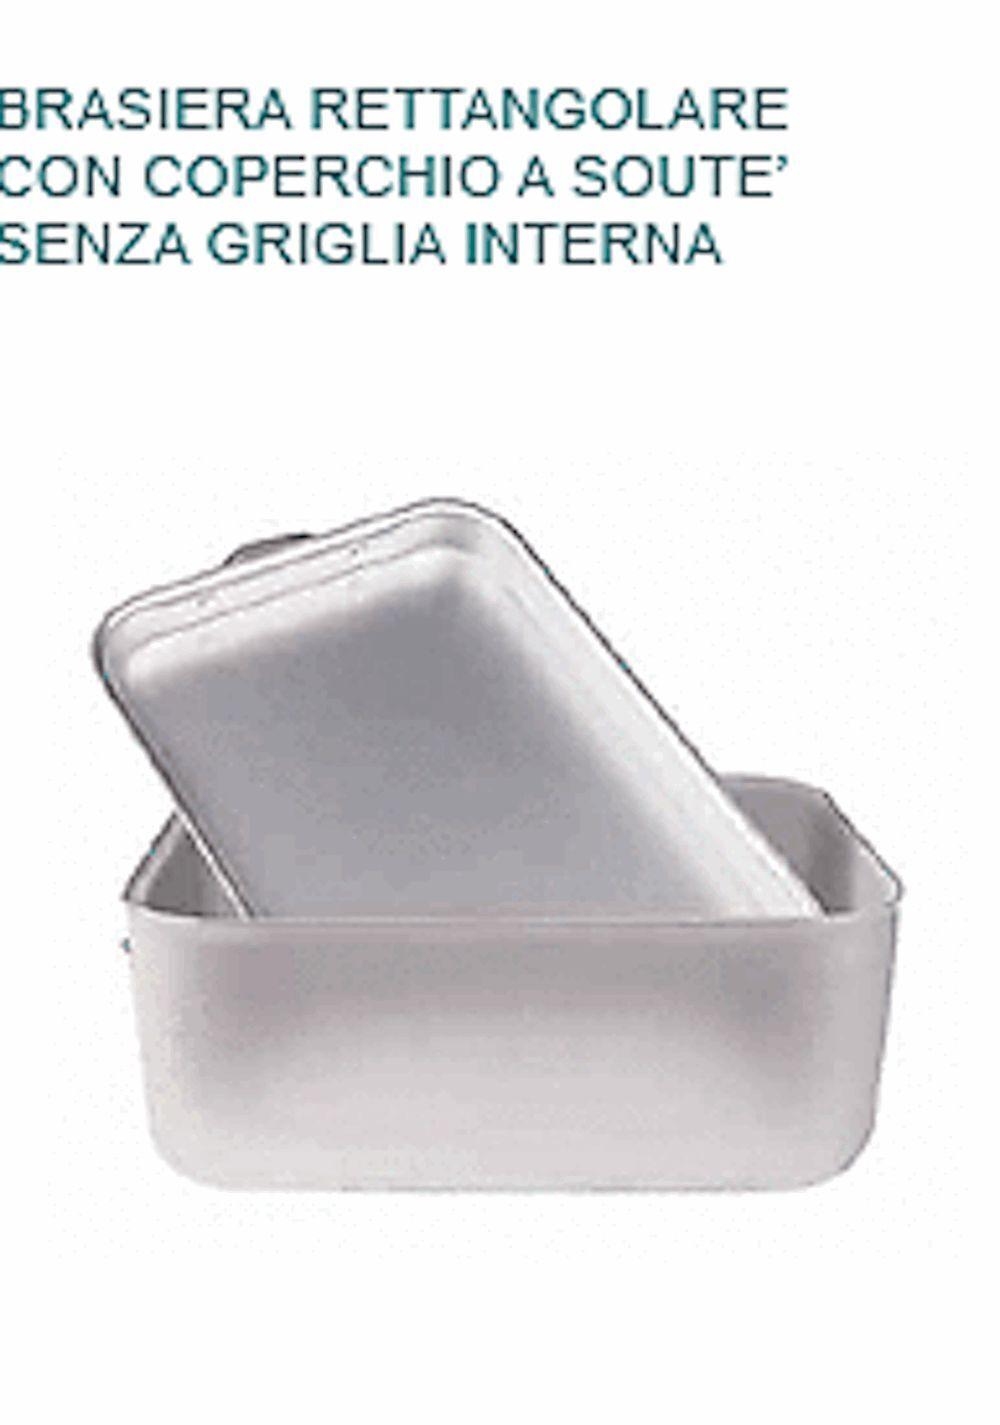 BRASIERA In Alluminio cm 70X45X20H Coperchio Souté Professionale Pentole Agnelli Agnelli Pentole 3eecb3